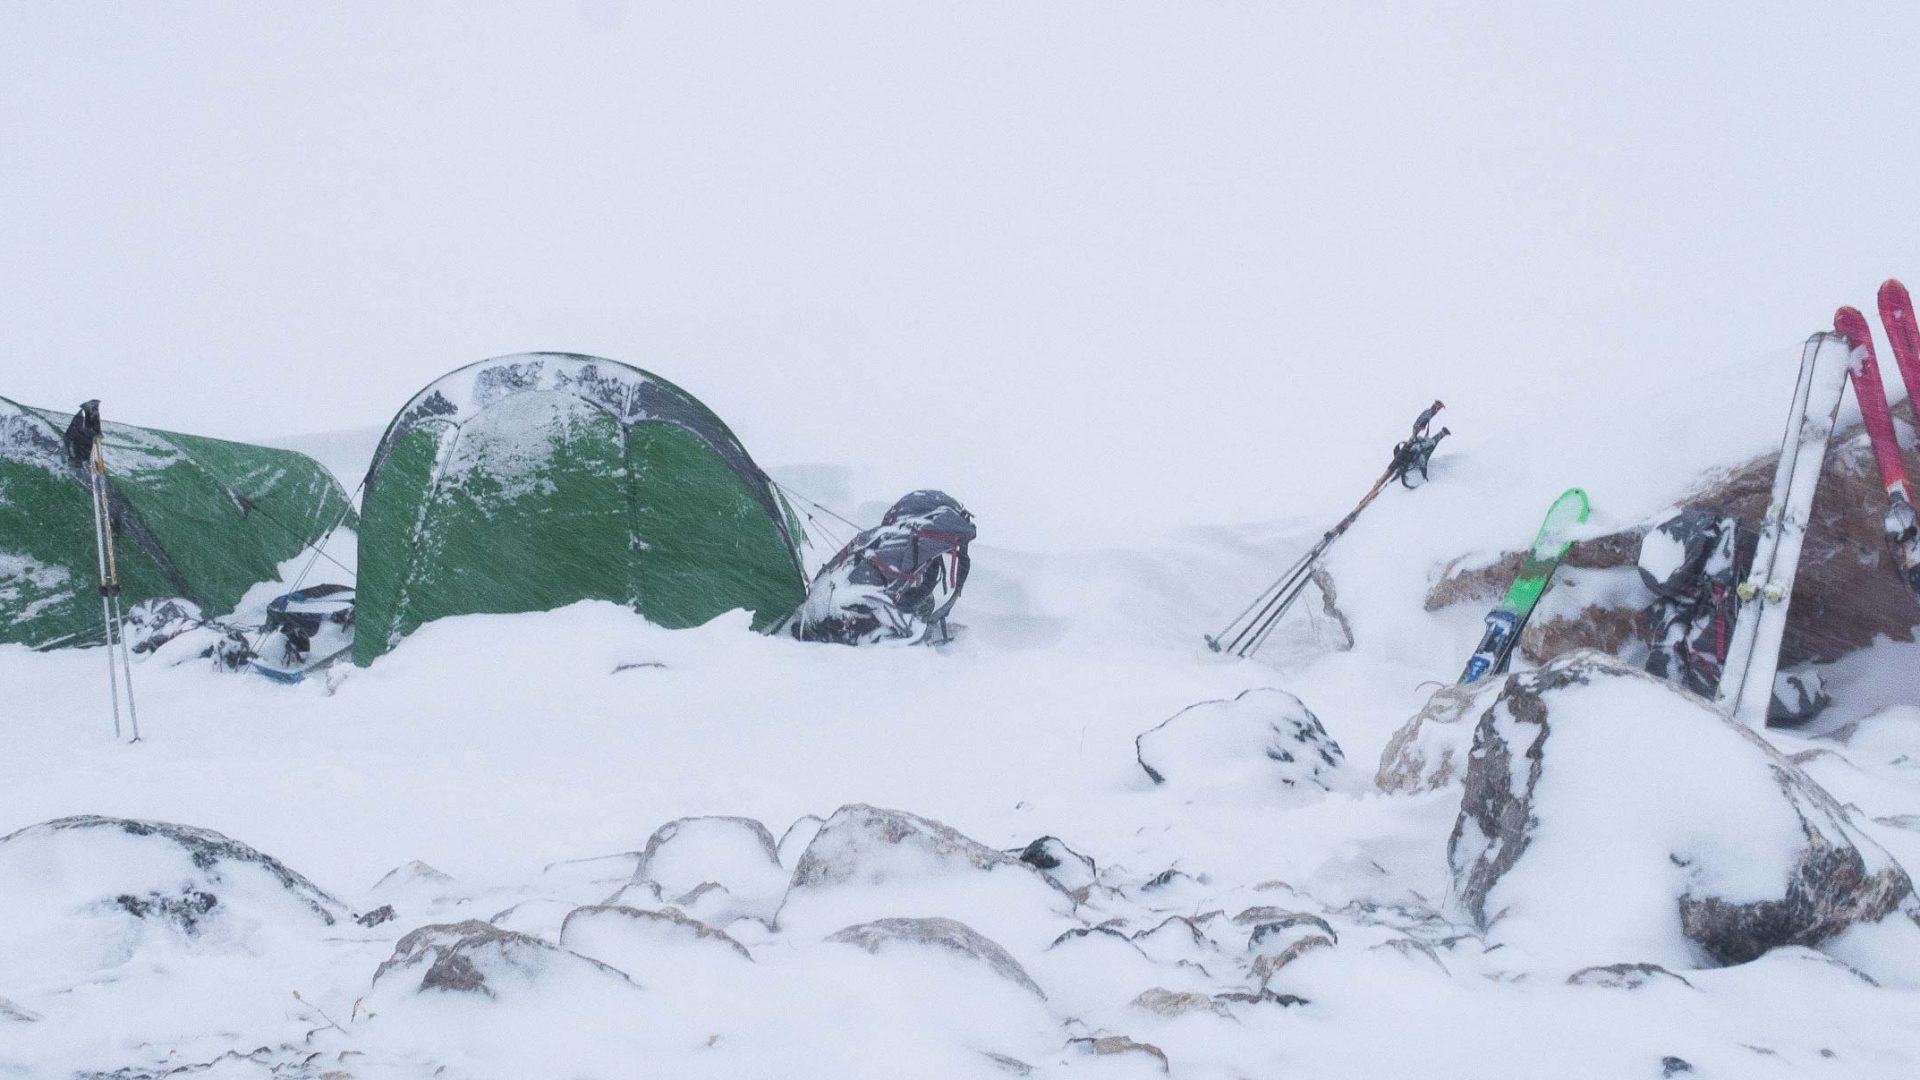 Tents in heavy snow in Upper Suknob Valley, Tajikistan.